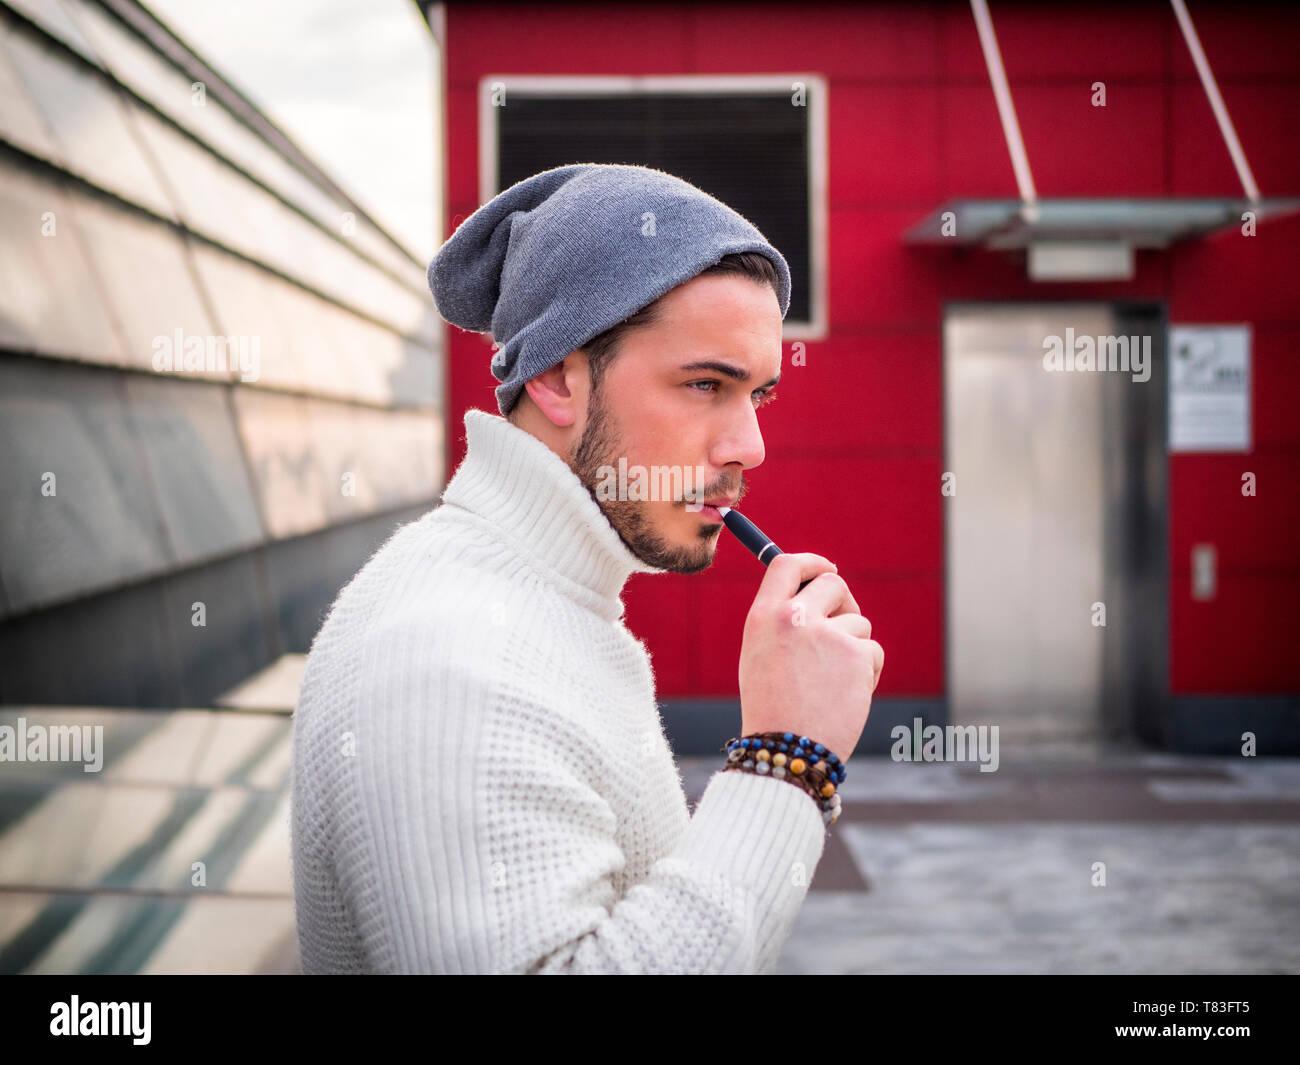 Young man vaping, smoking e-cigarette outdoor - Stock Image